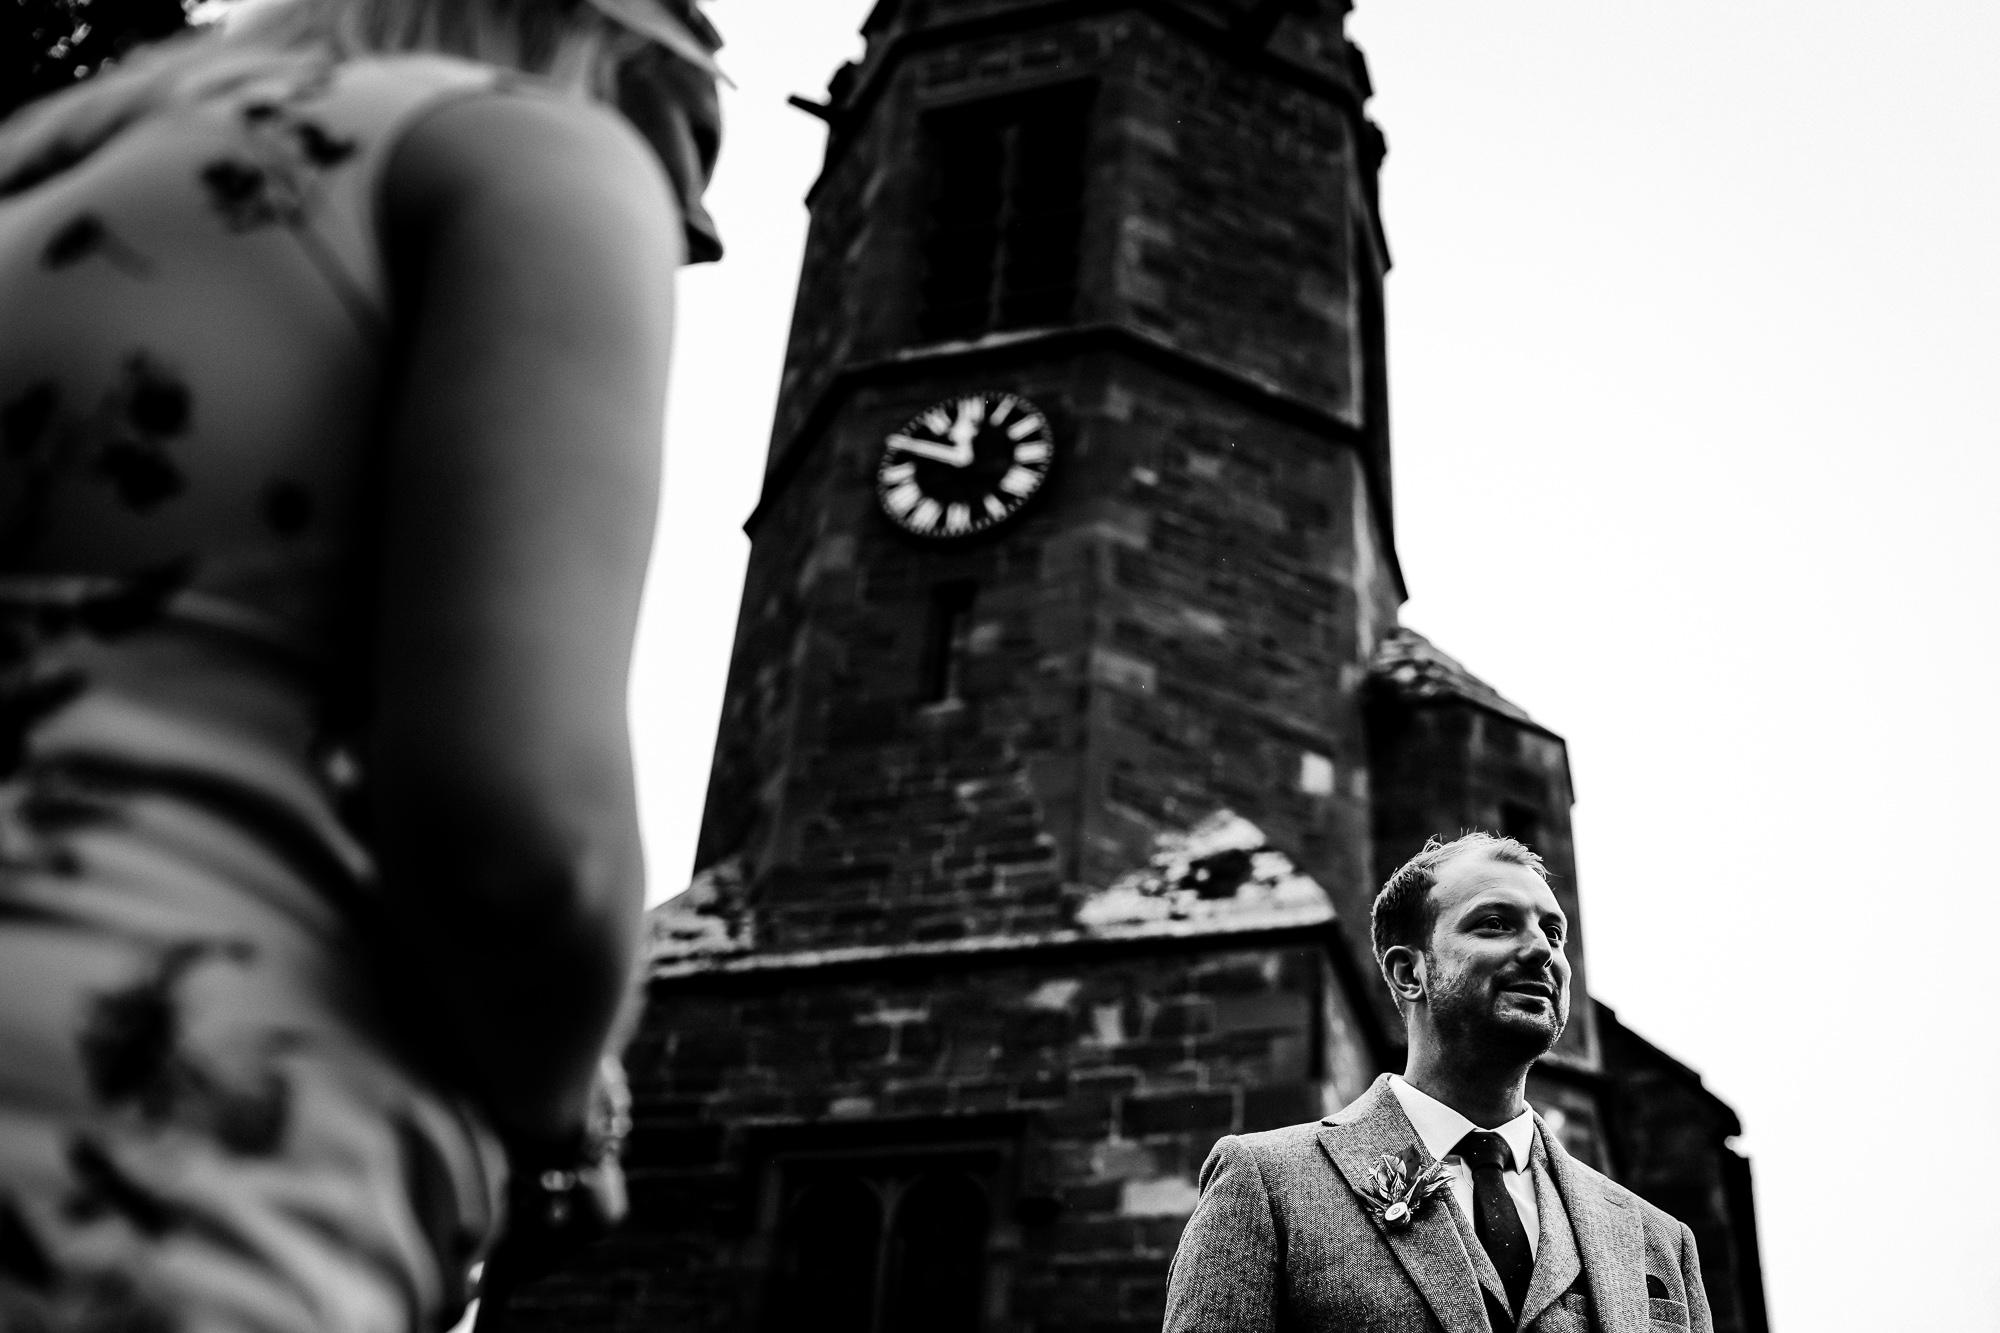 High Barn Wedding photographer lake distect penrith documentry wedding photography (19 of 57).jpg